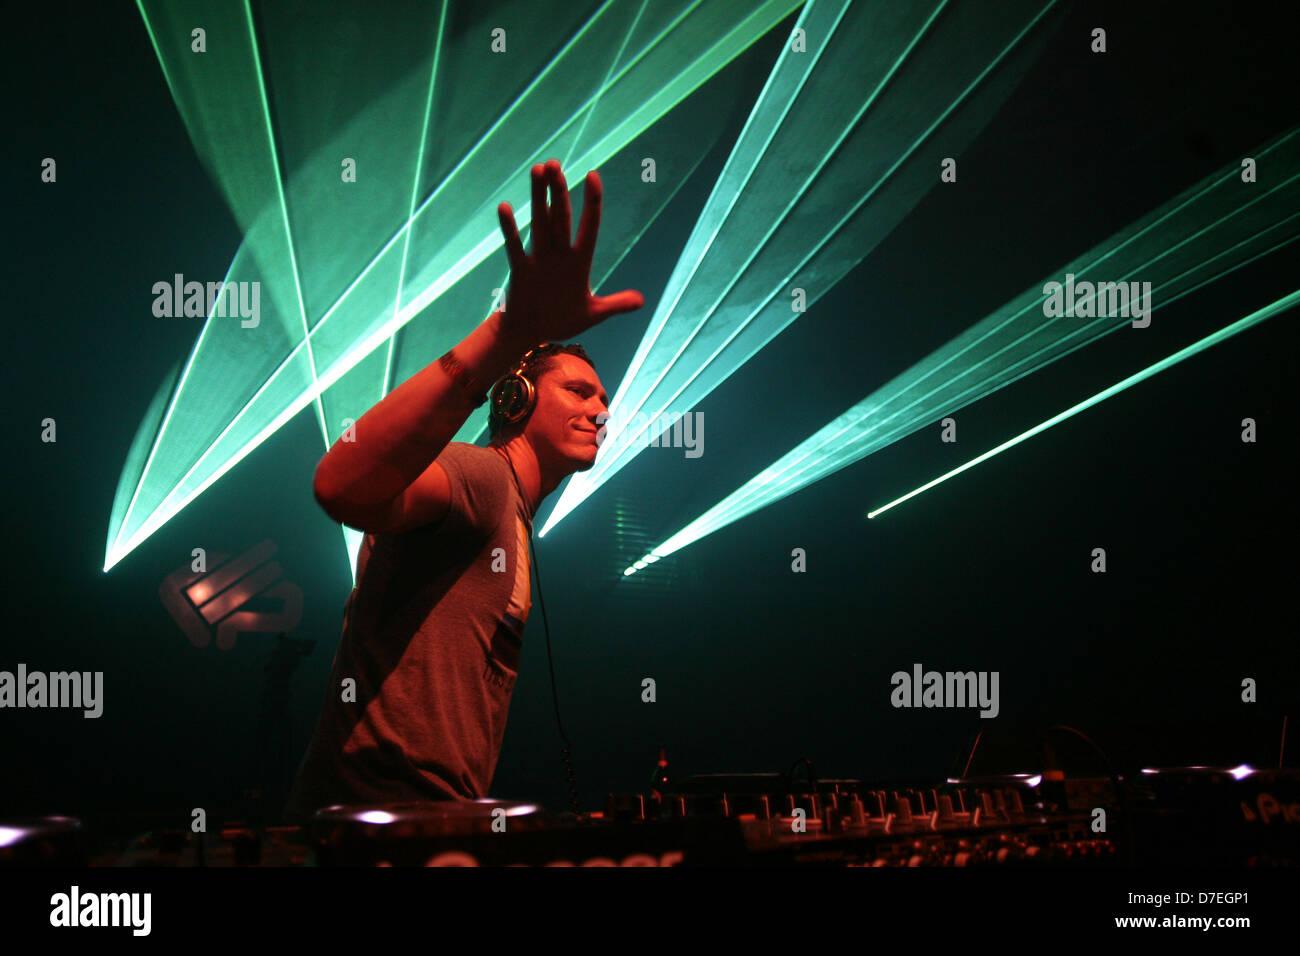 DJMag top-20 DJ: Tiesto - Stock Image